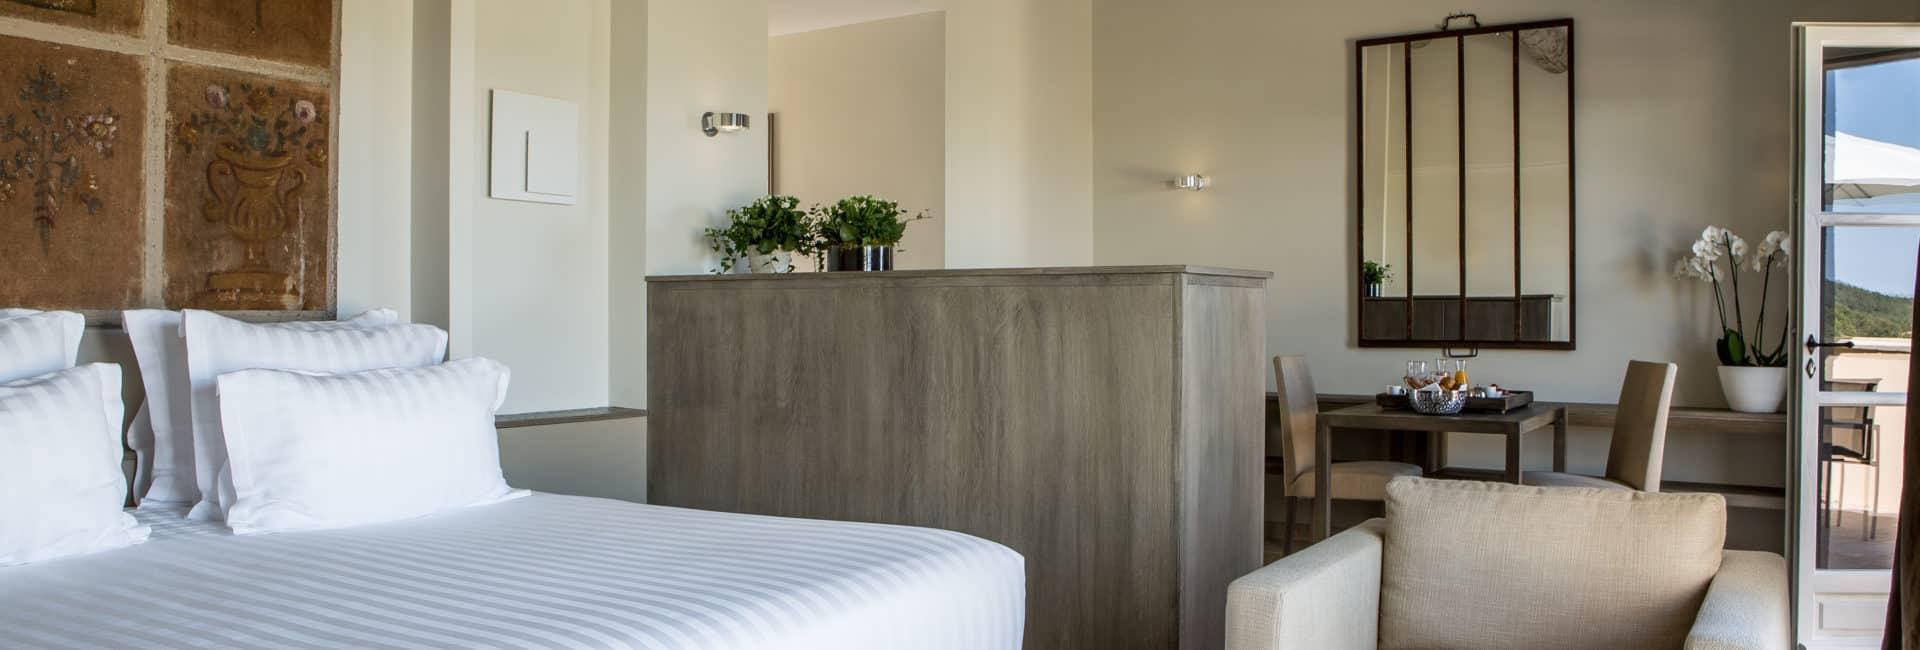 Coquillade Resorts & Spa